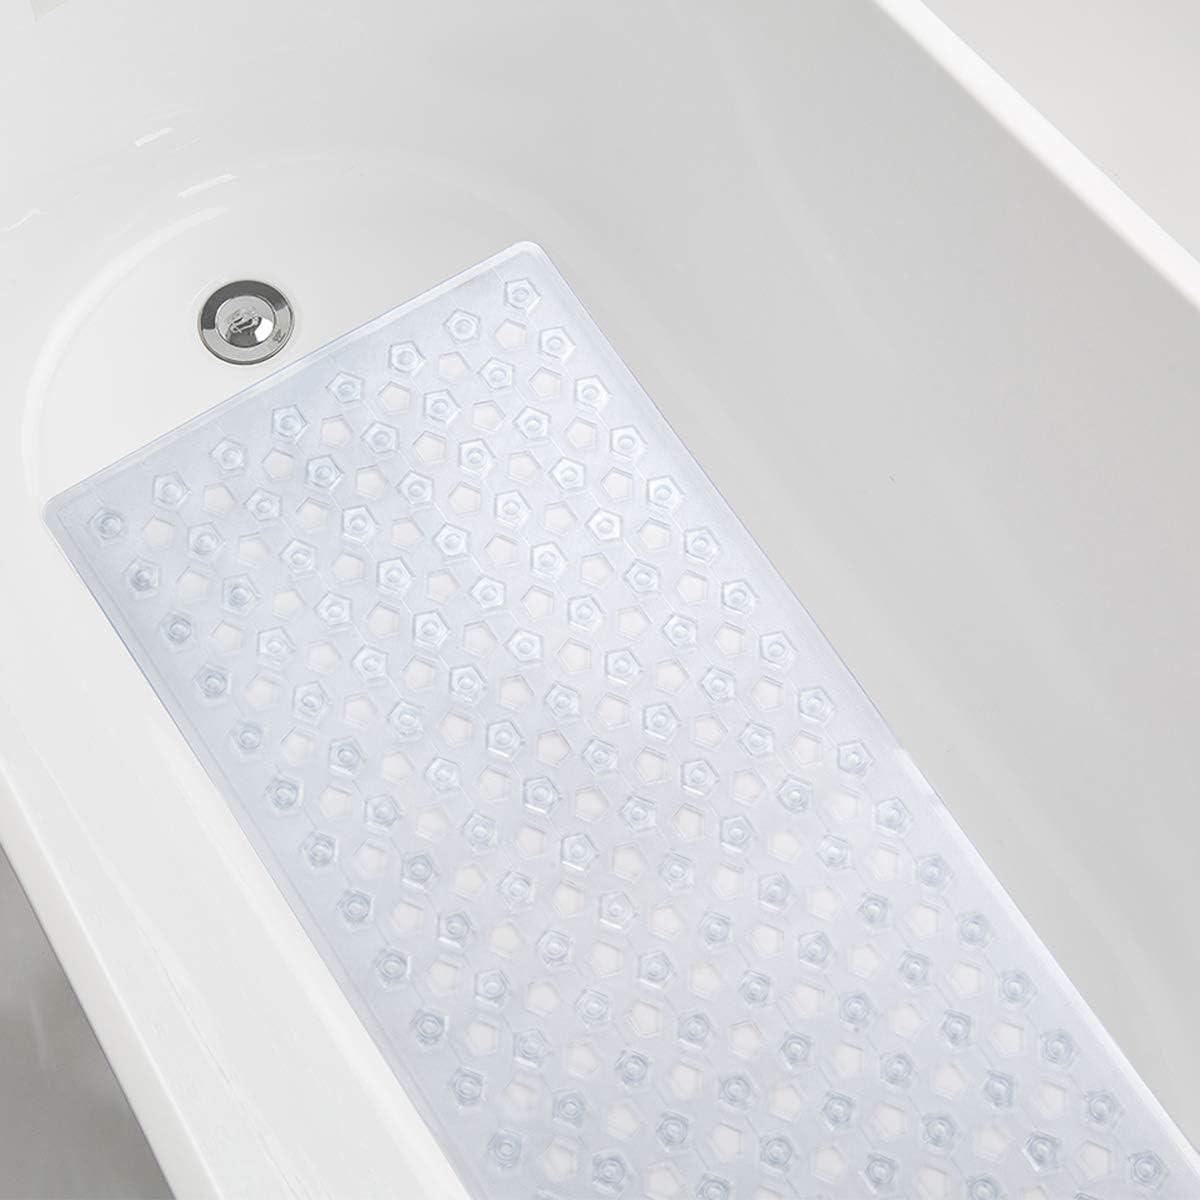 AmazerBath Bath Tub Mat, Non-Slip Shower Mats with Larger Pentagonal Drain Holes, Quick Drying, Machine Washable, 35 x 16 Inches (Clear): Home & Kitchen